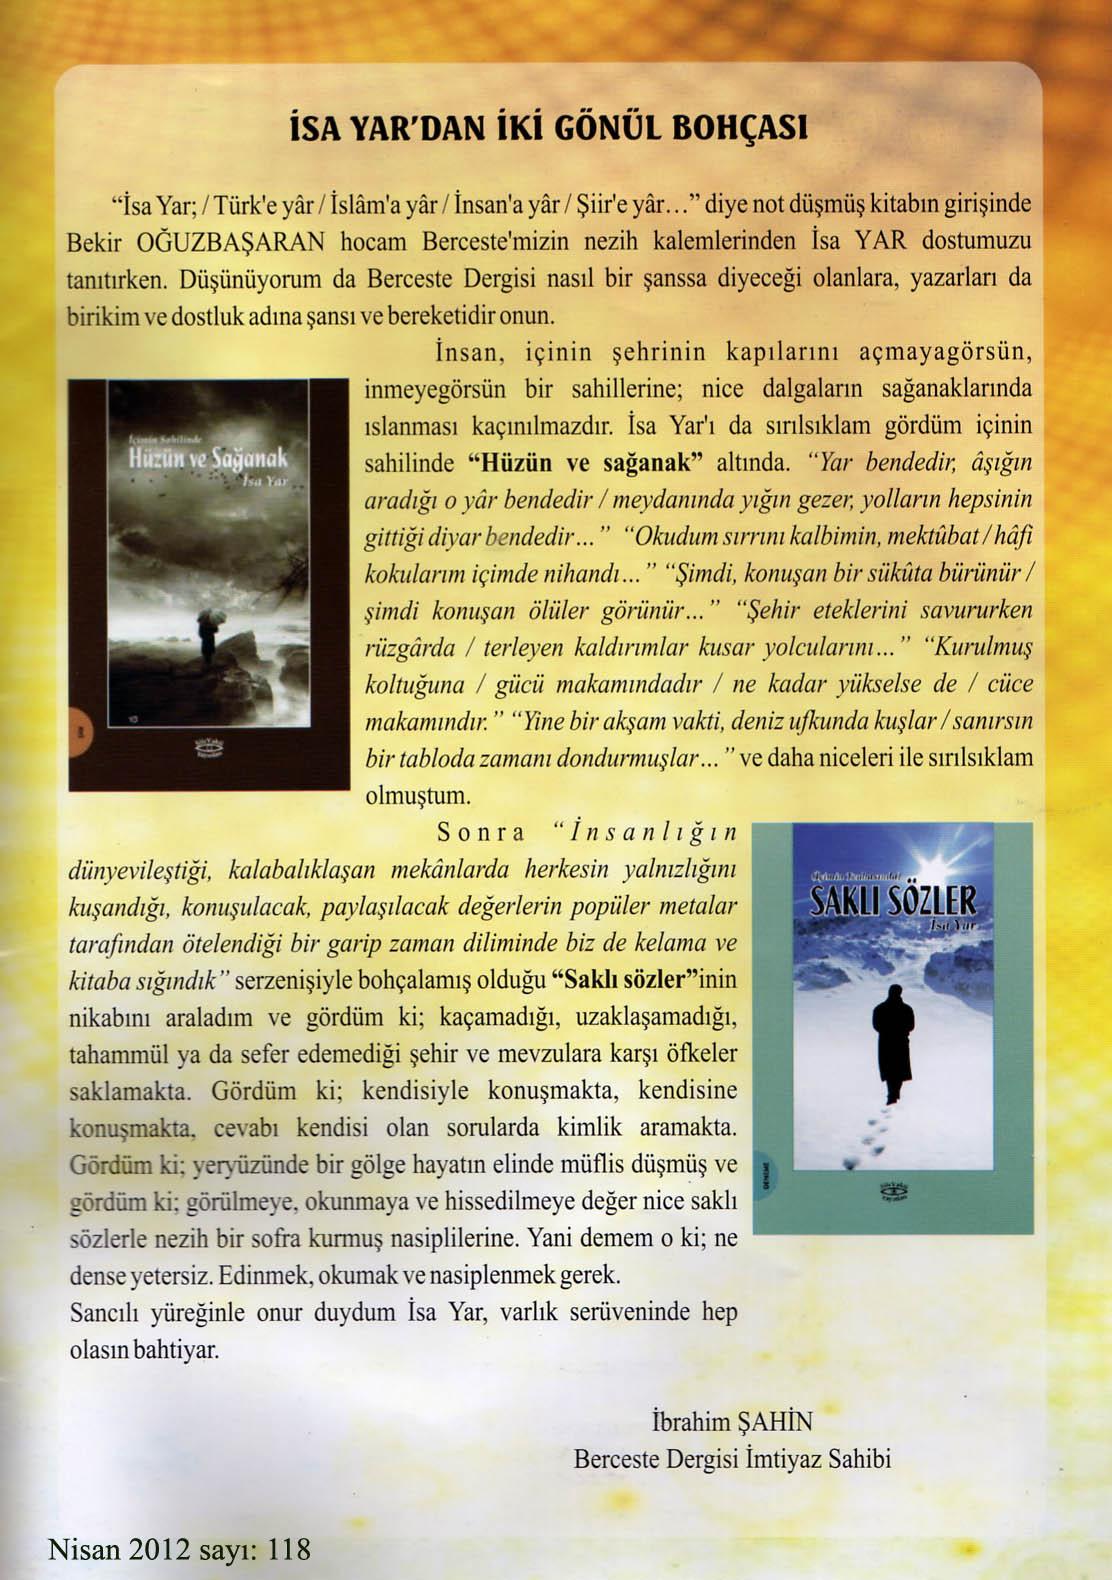 Berceste_dergisi_Nisan_2012